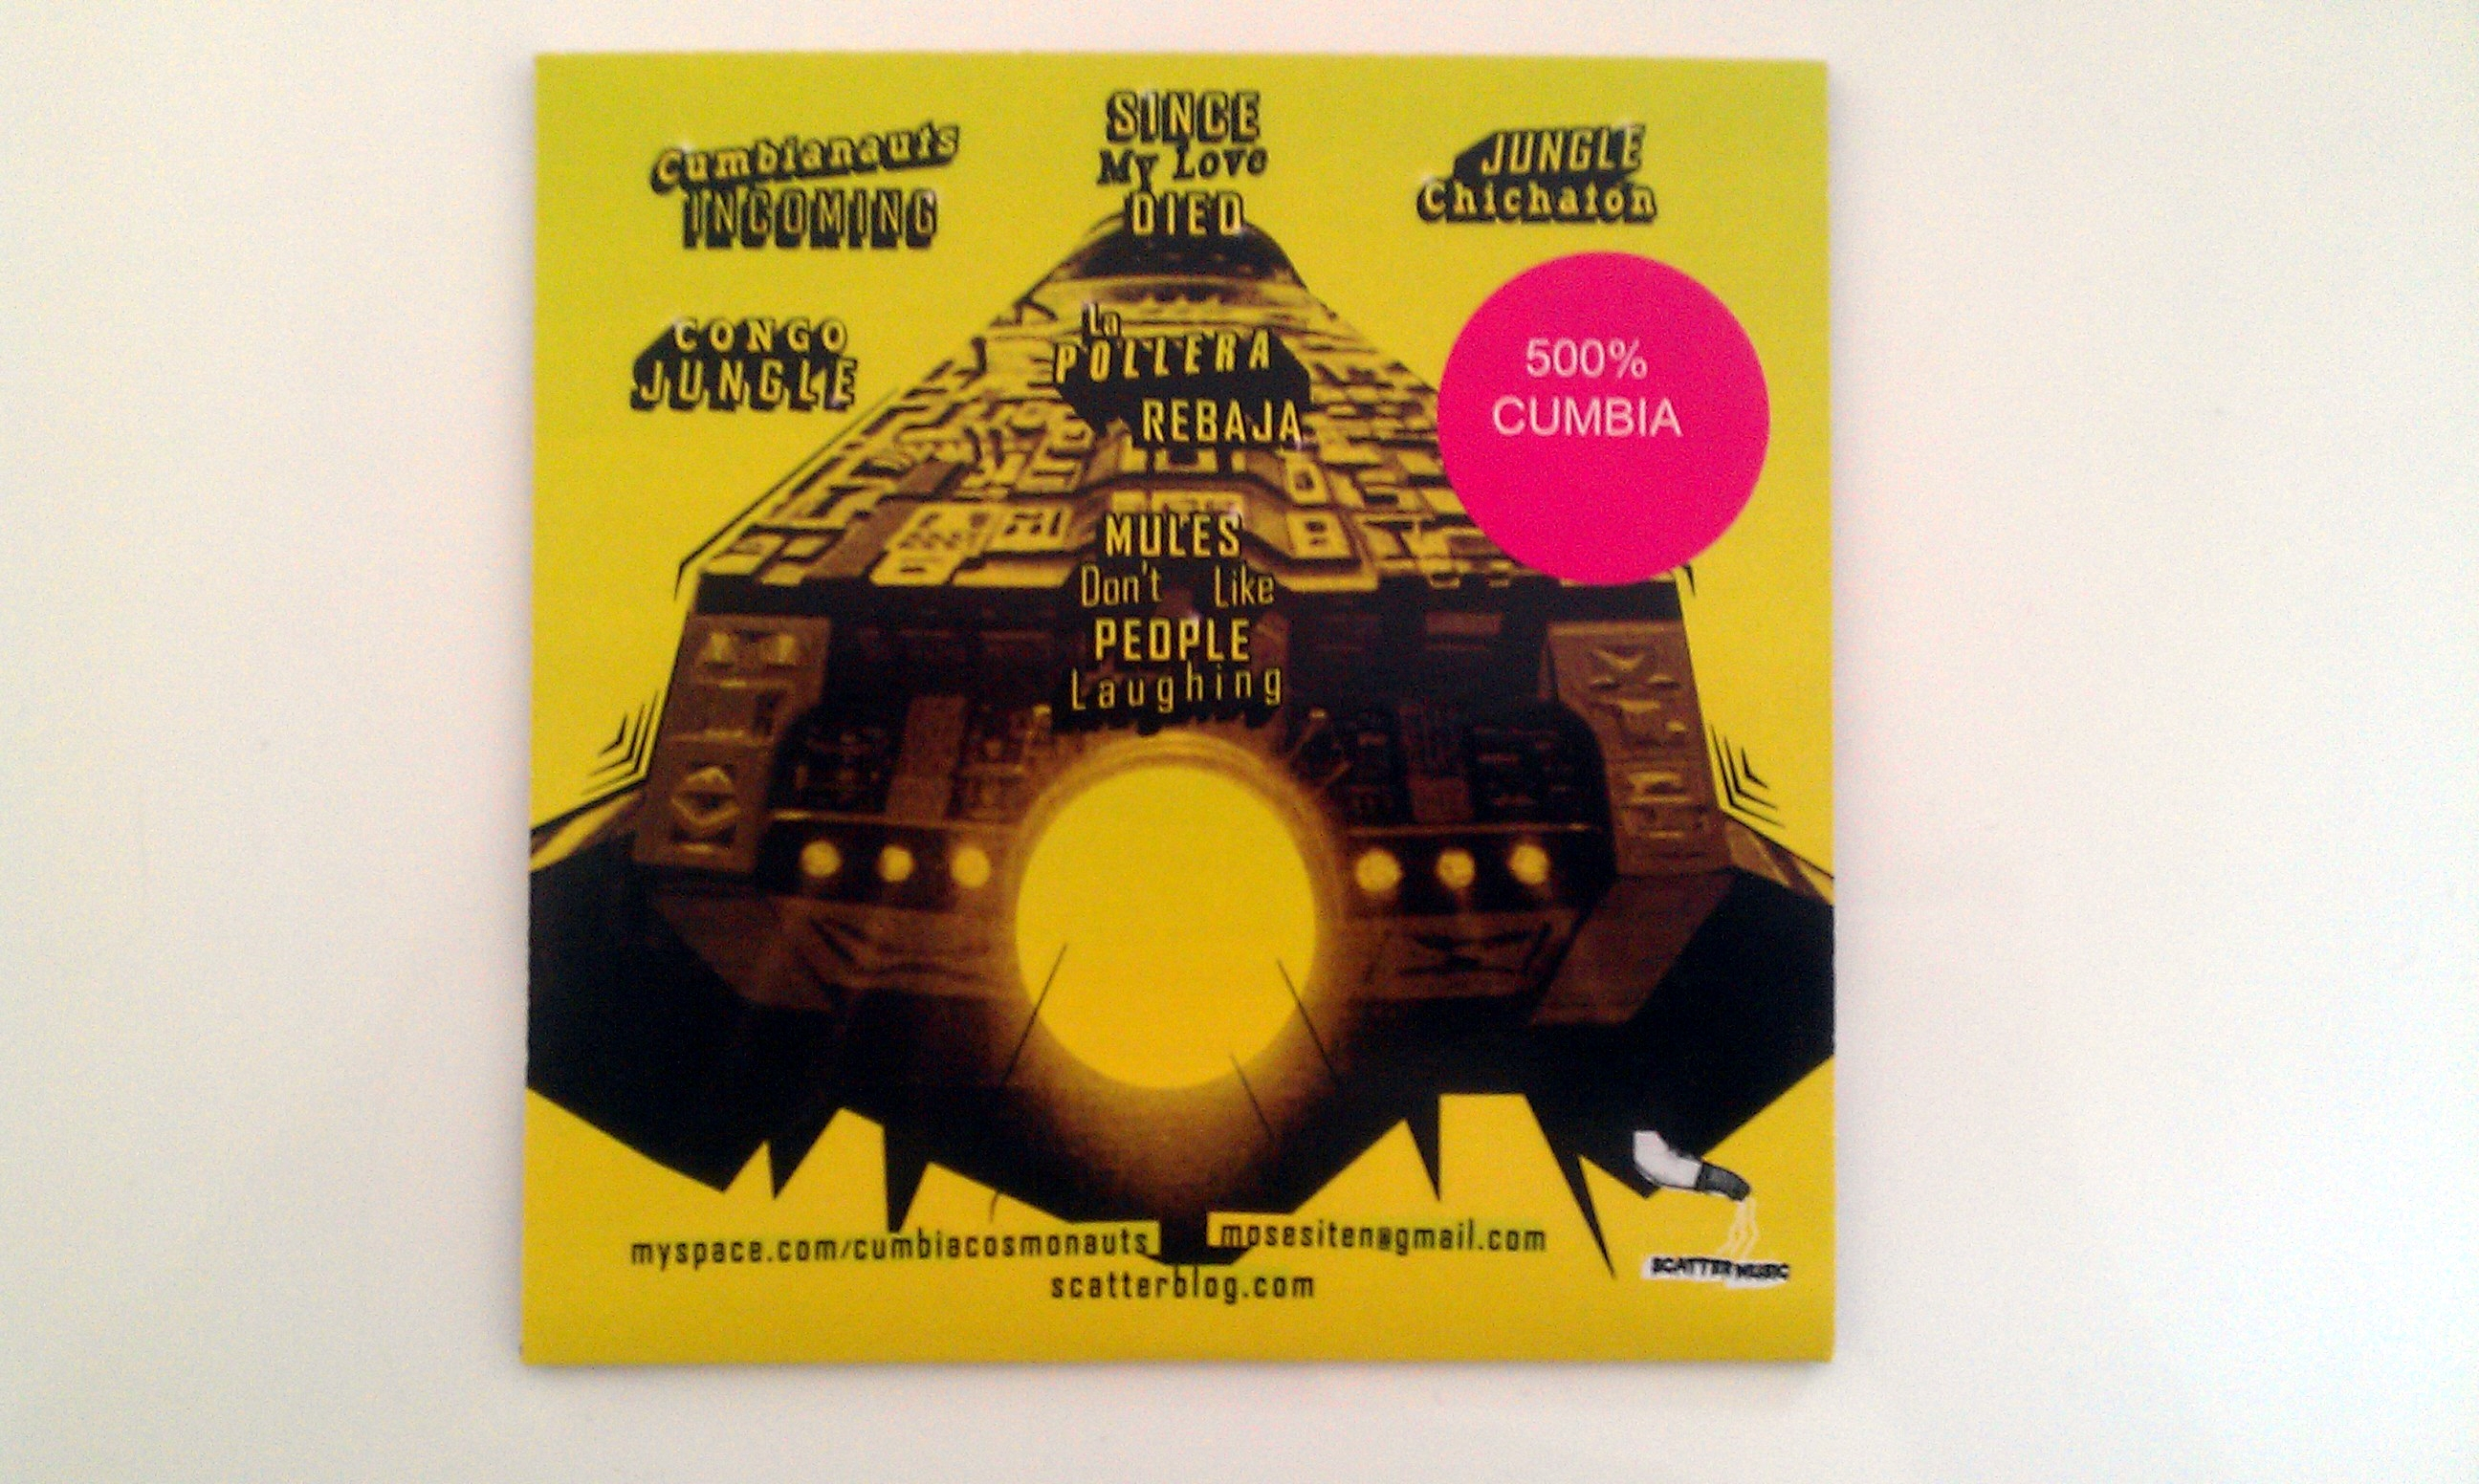 Cumbia Cosmonauts CD - Back